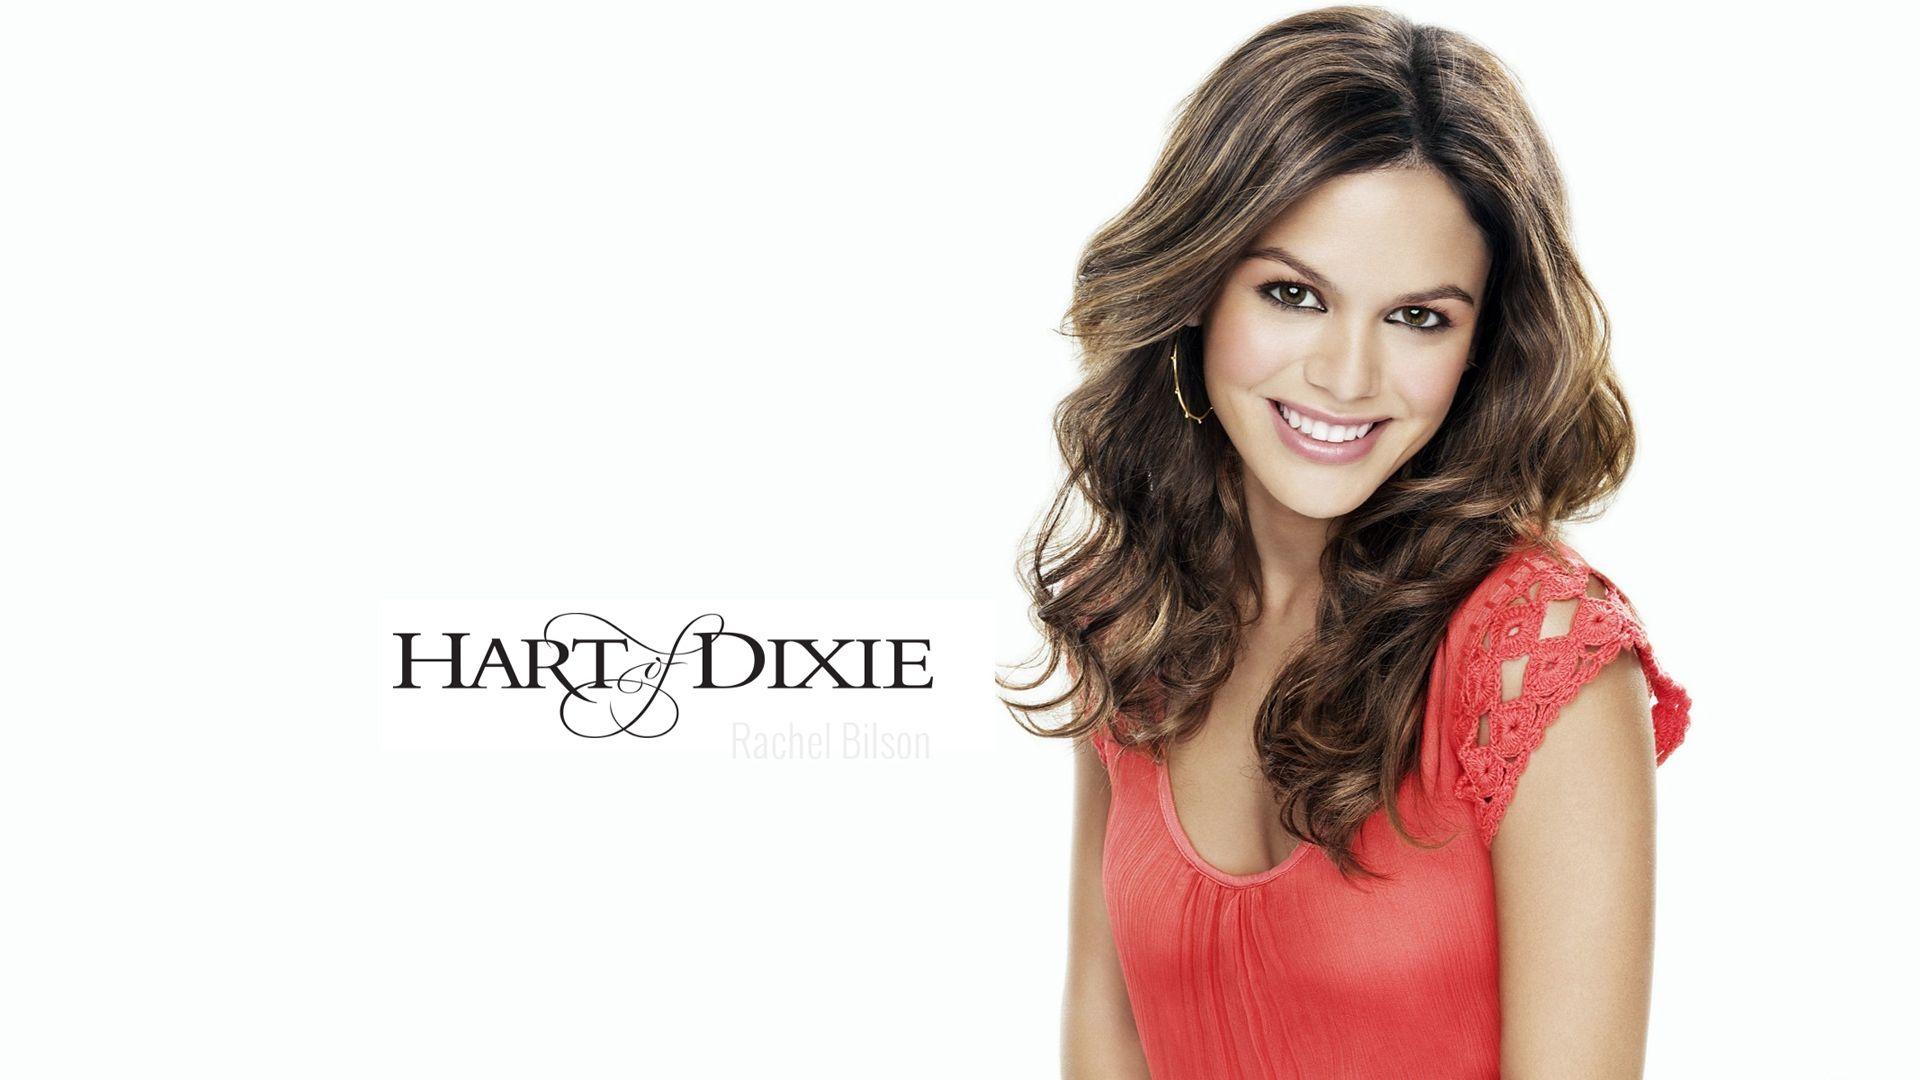 Beautiful Rachel Bilson Hd Wallpaper Gg Hart Of Dixie Rachel